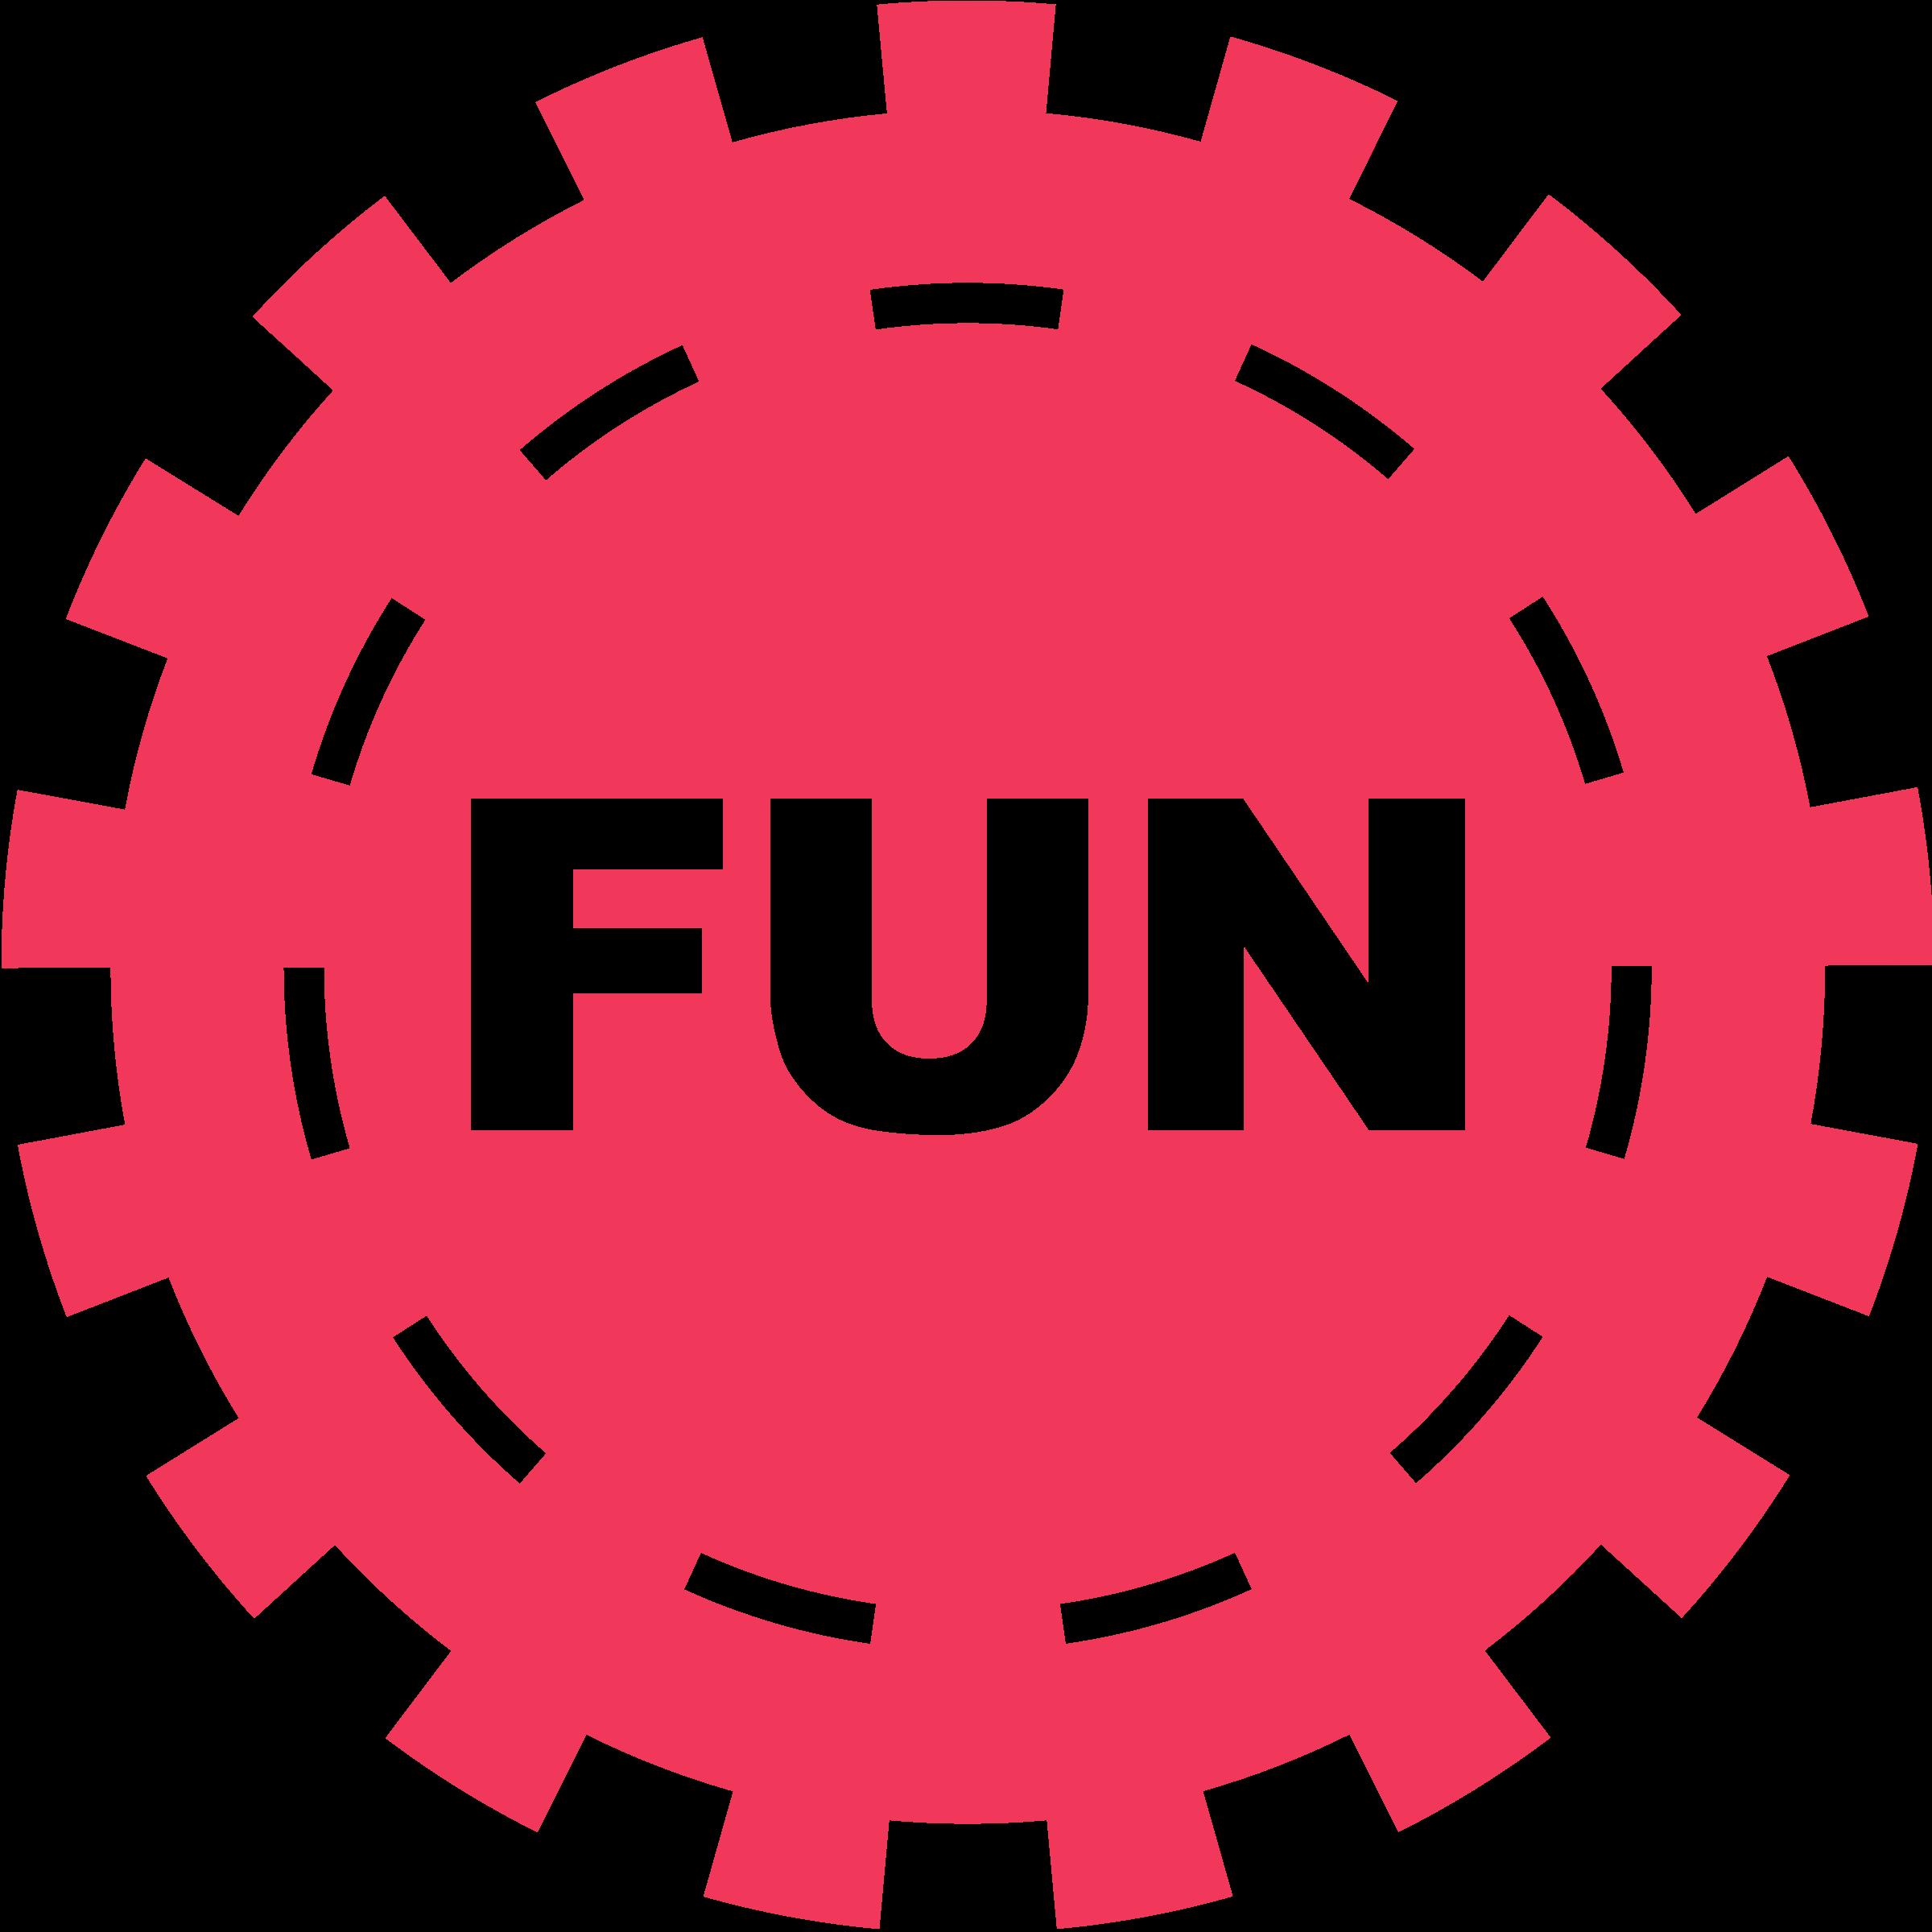 Games clipart funfair game. Biz business finance search